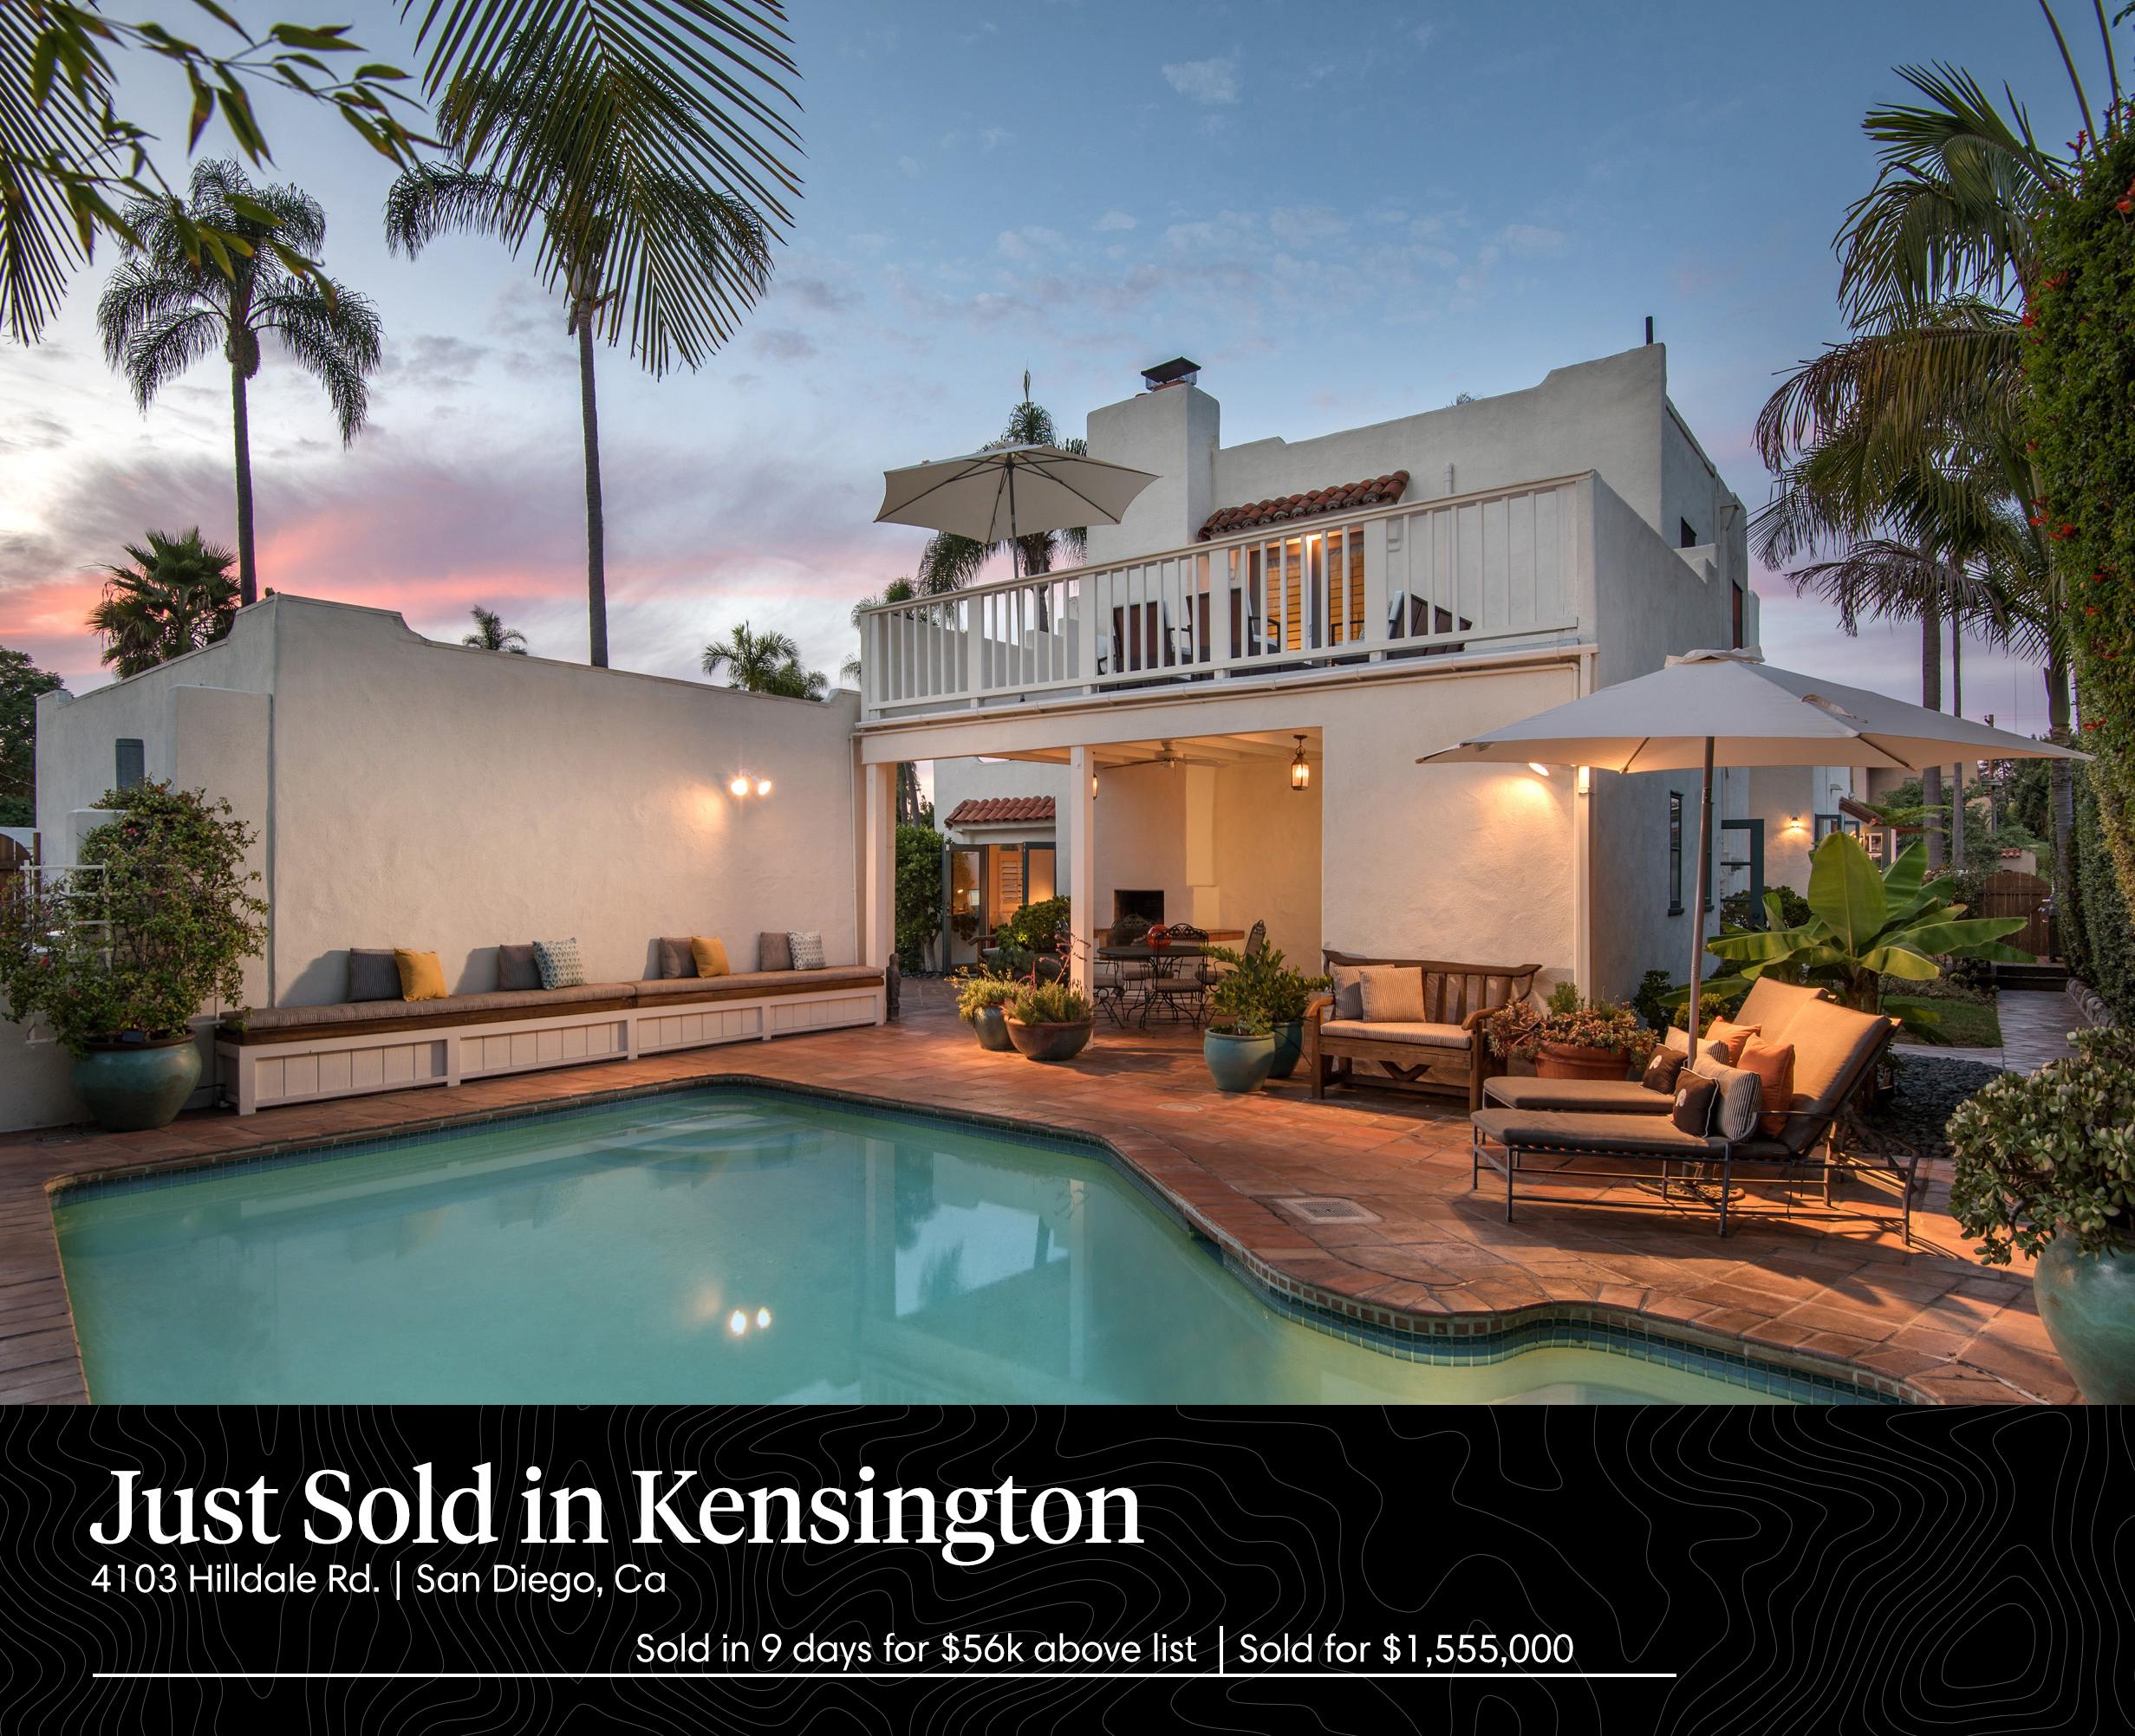 just_sold4103.jpg